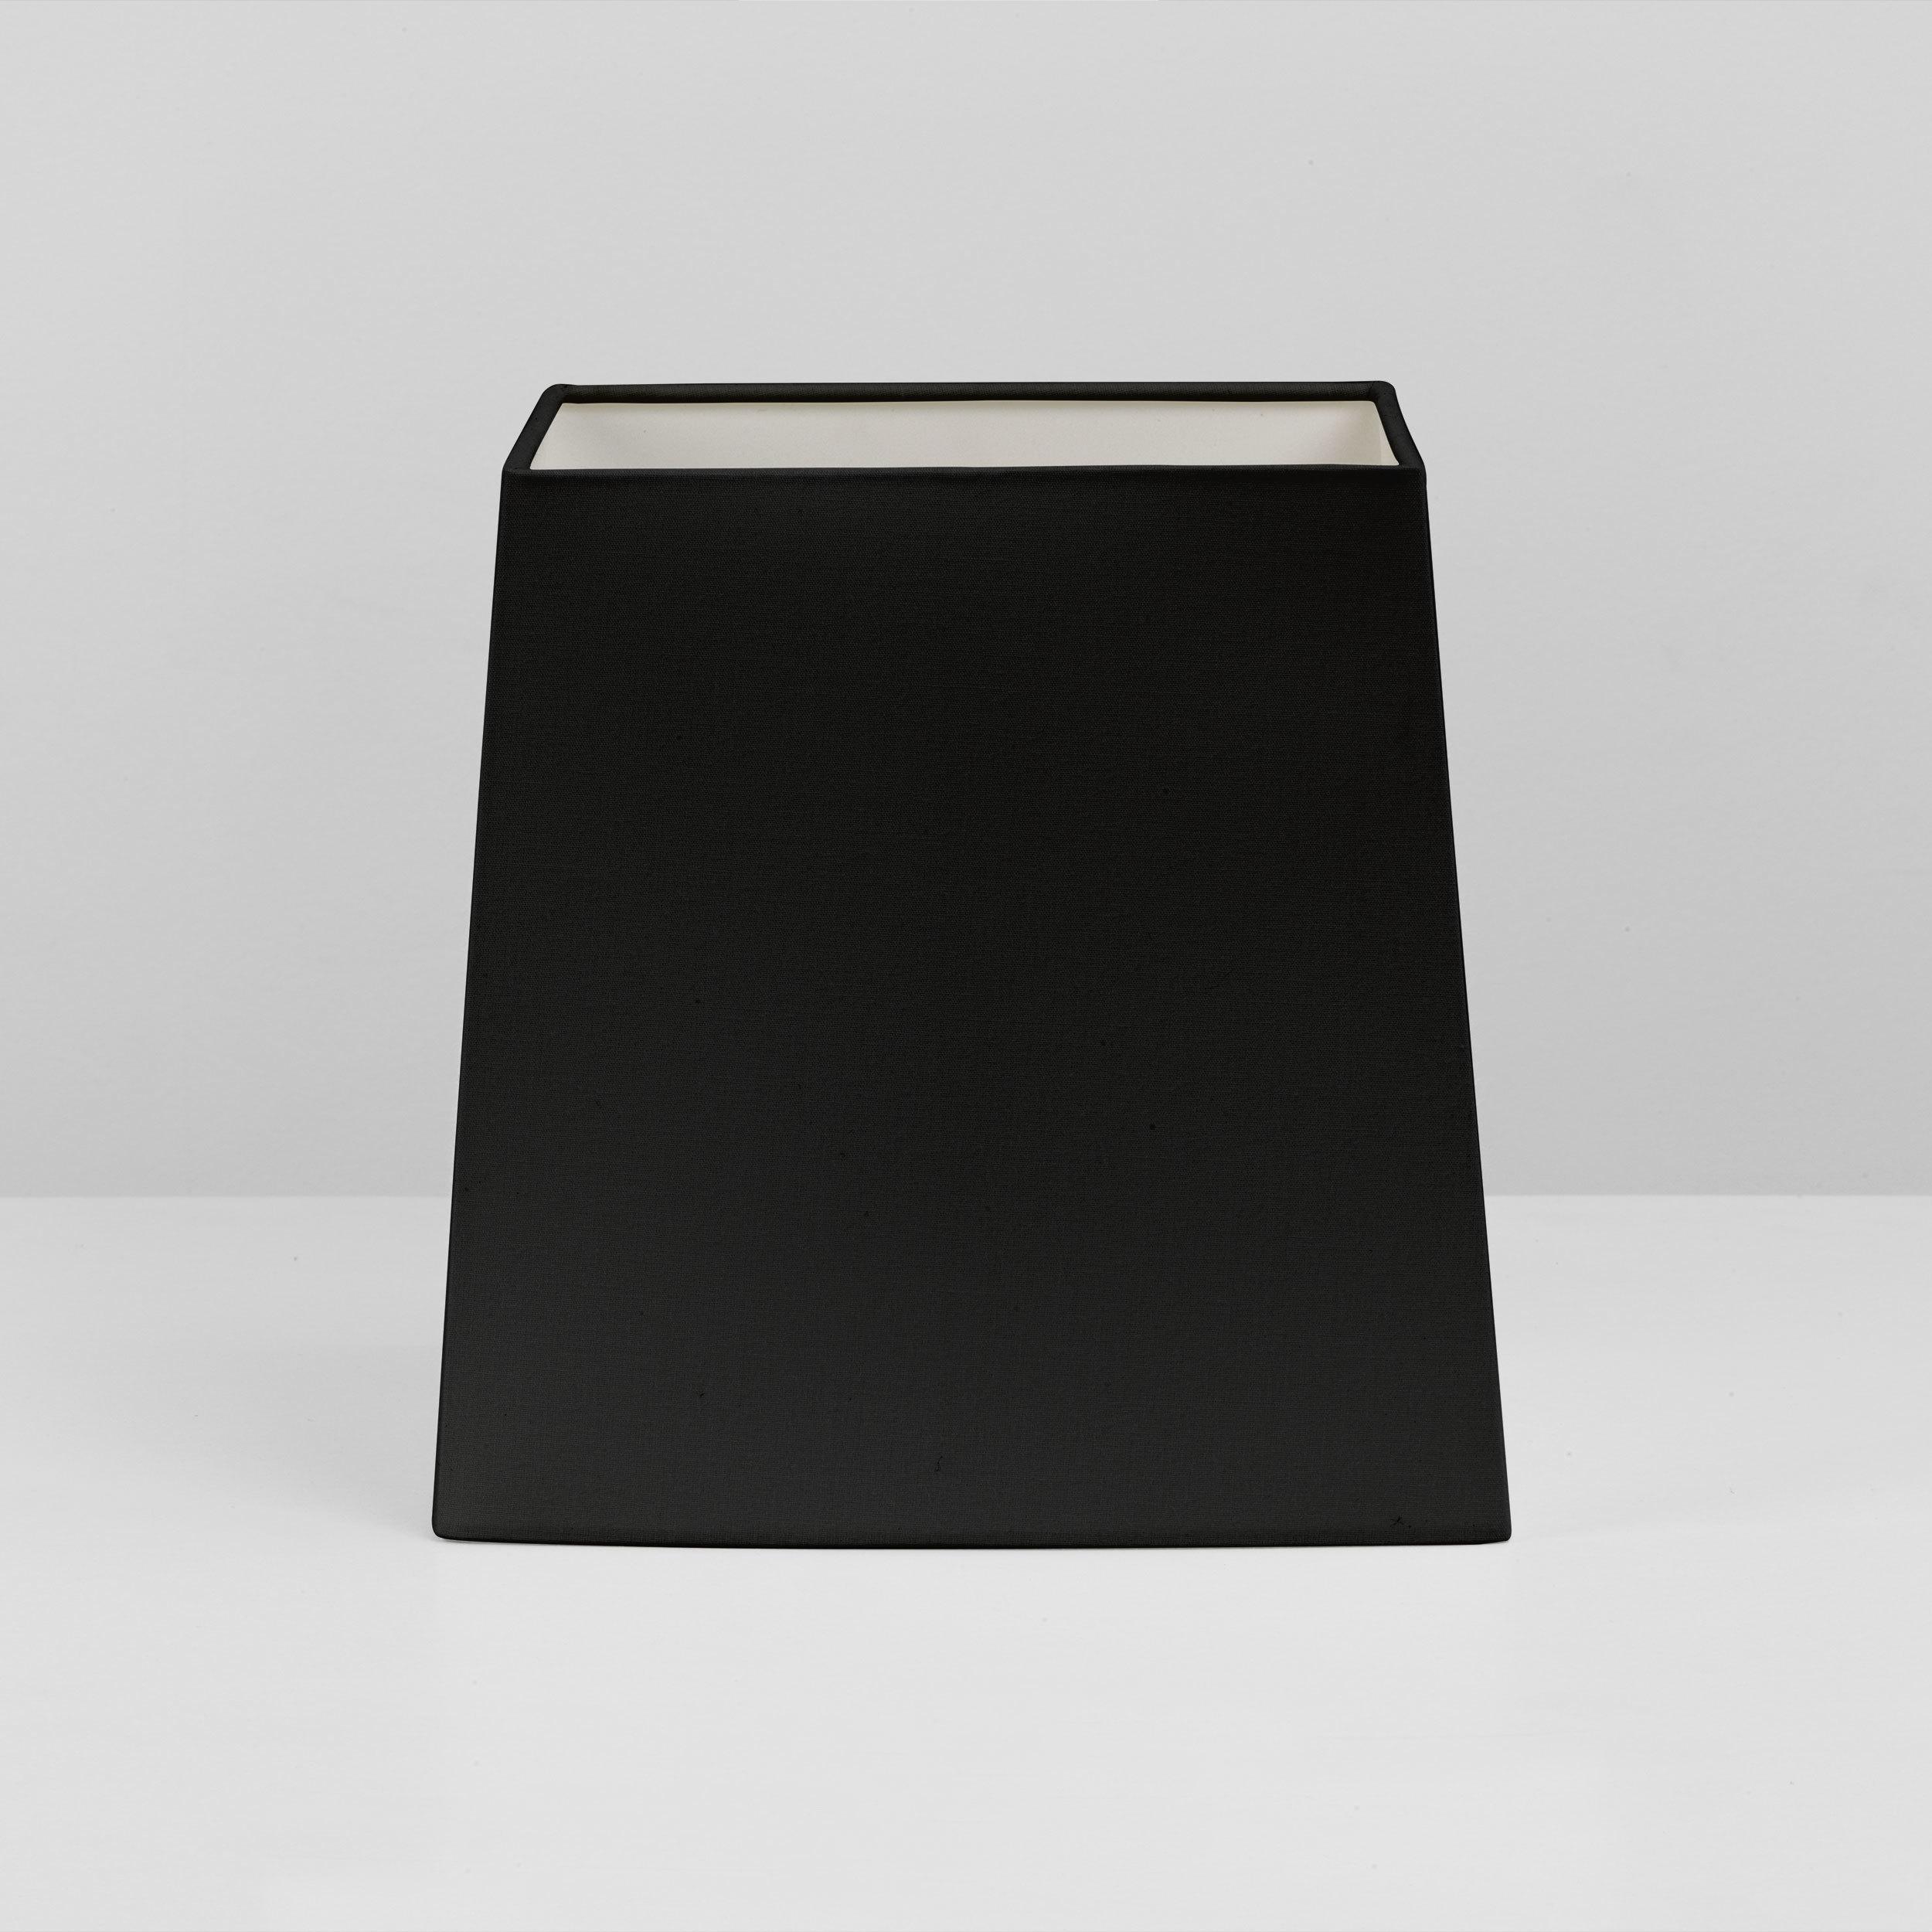 Абажур Astro Tapered Square 5005002 (4019), черный, текстиль - фото 2